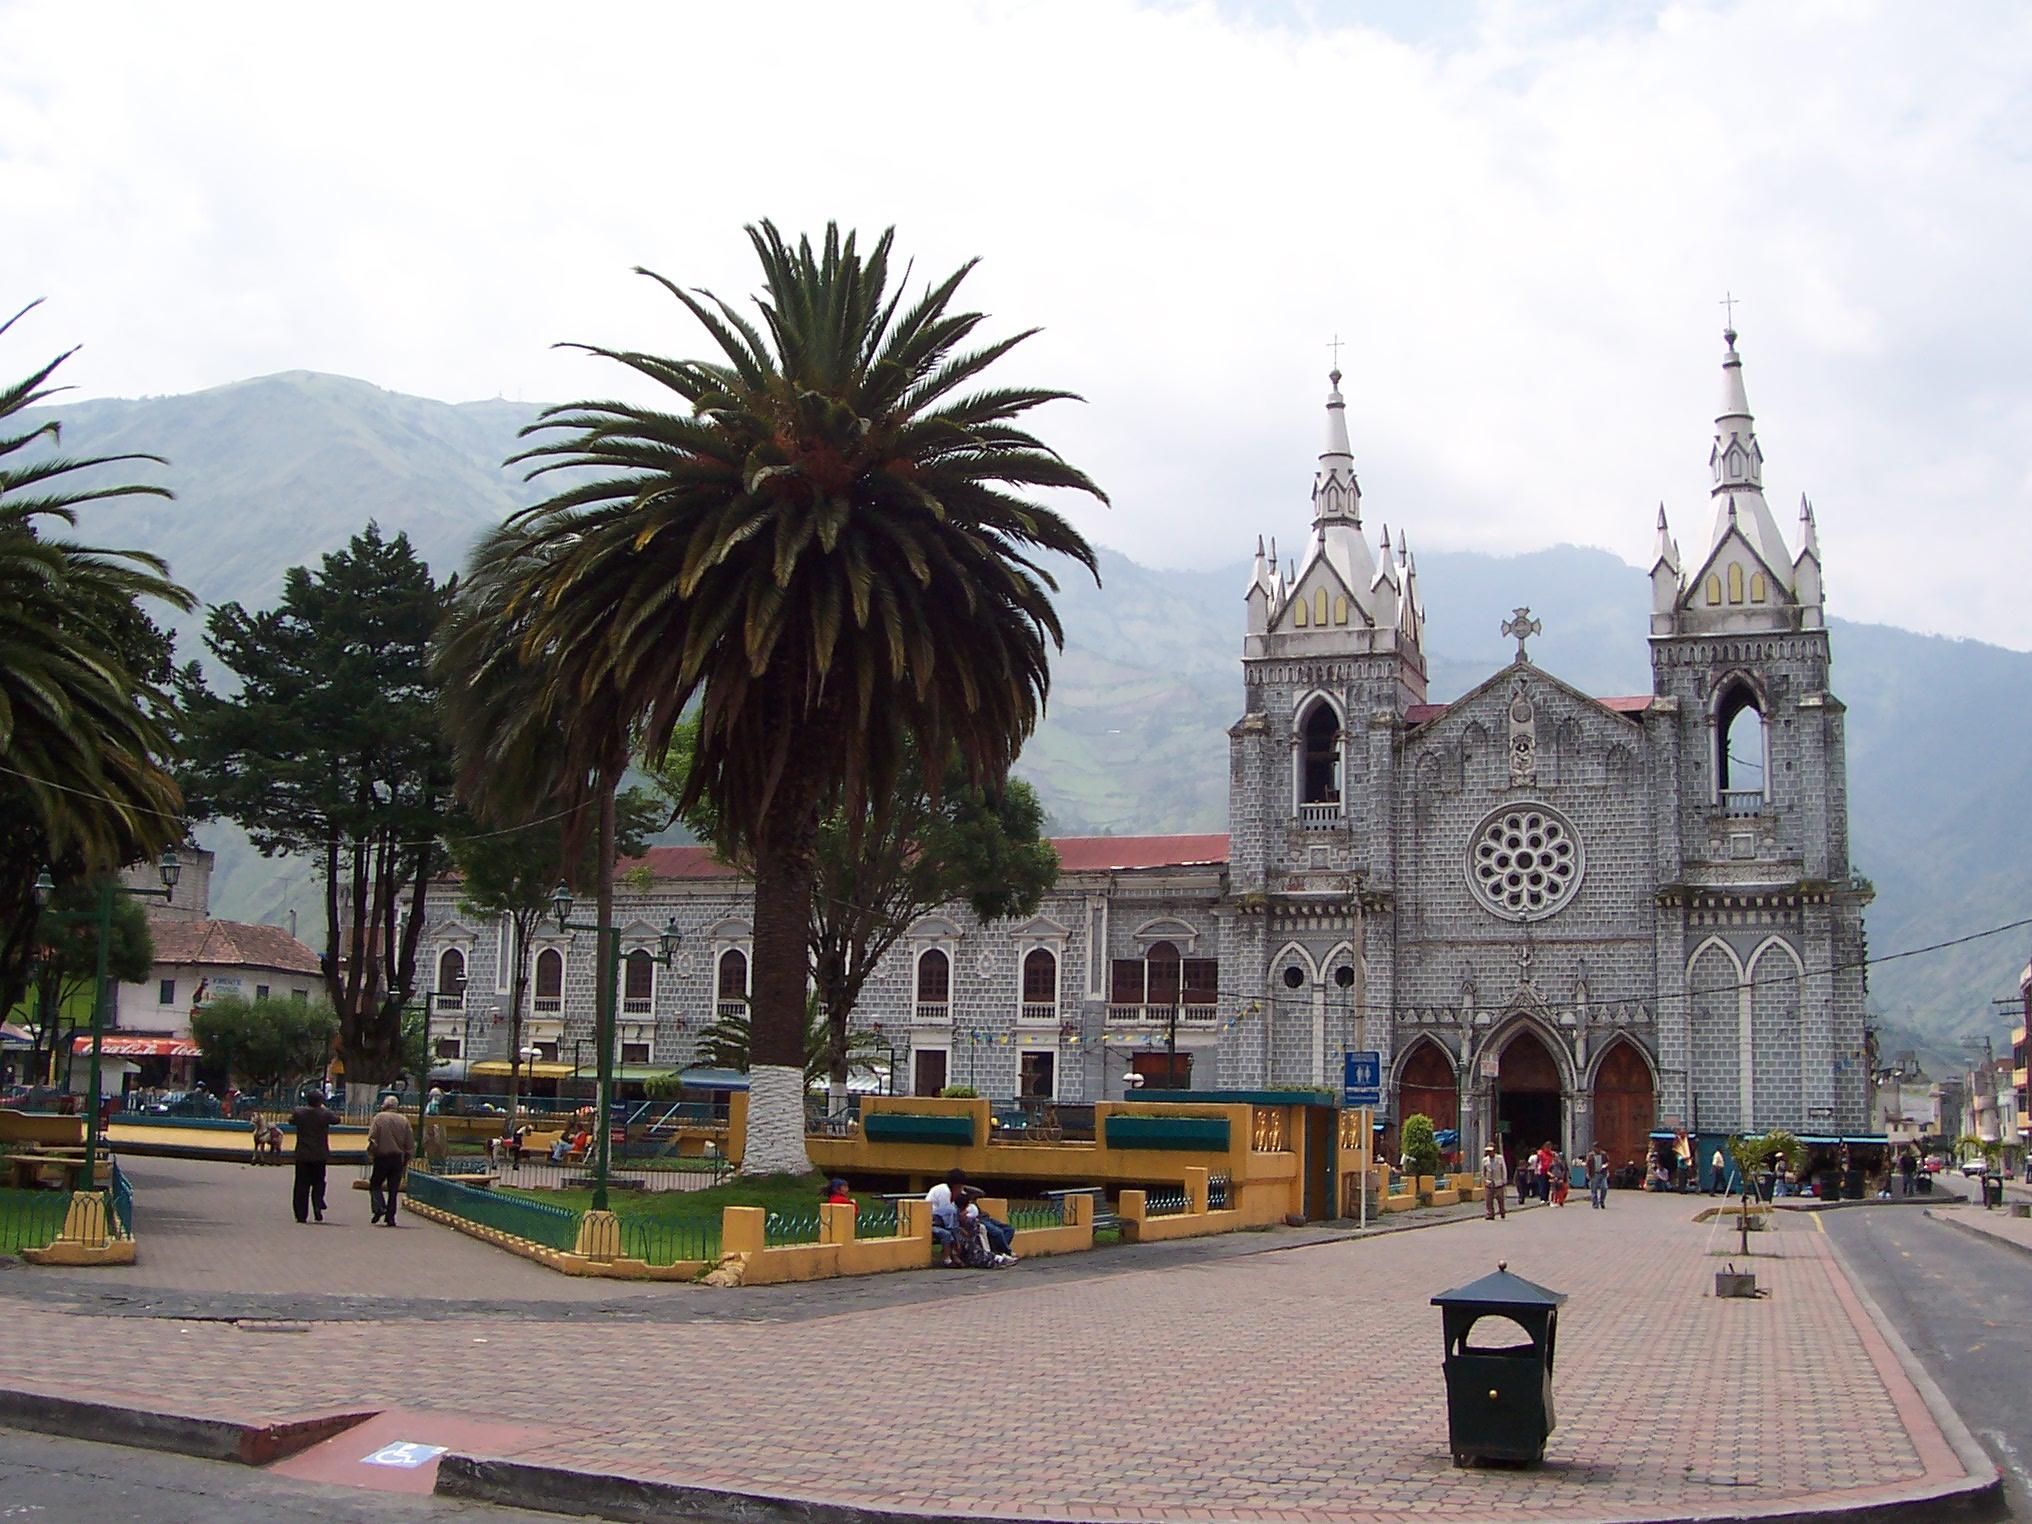 Imagenes De Baños Agua Santa:Johanna Gabriela: Baños de Agua Santa Ambato Privincia De Tungurahua